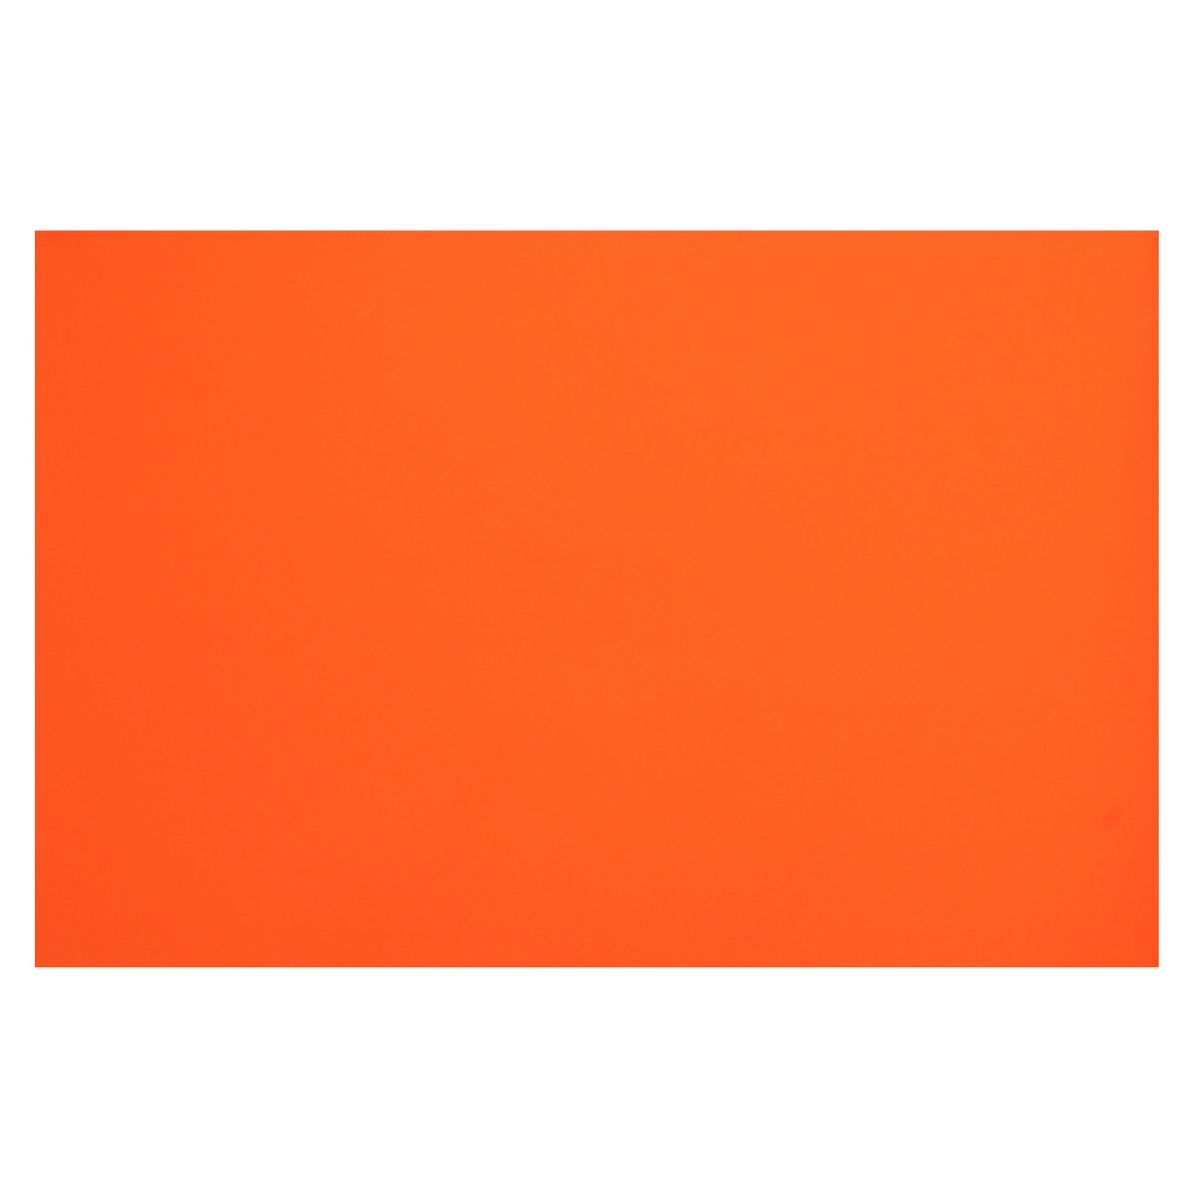 Image of 380mic Fluorescent Card 450x640mm, Orange